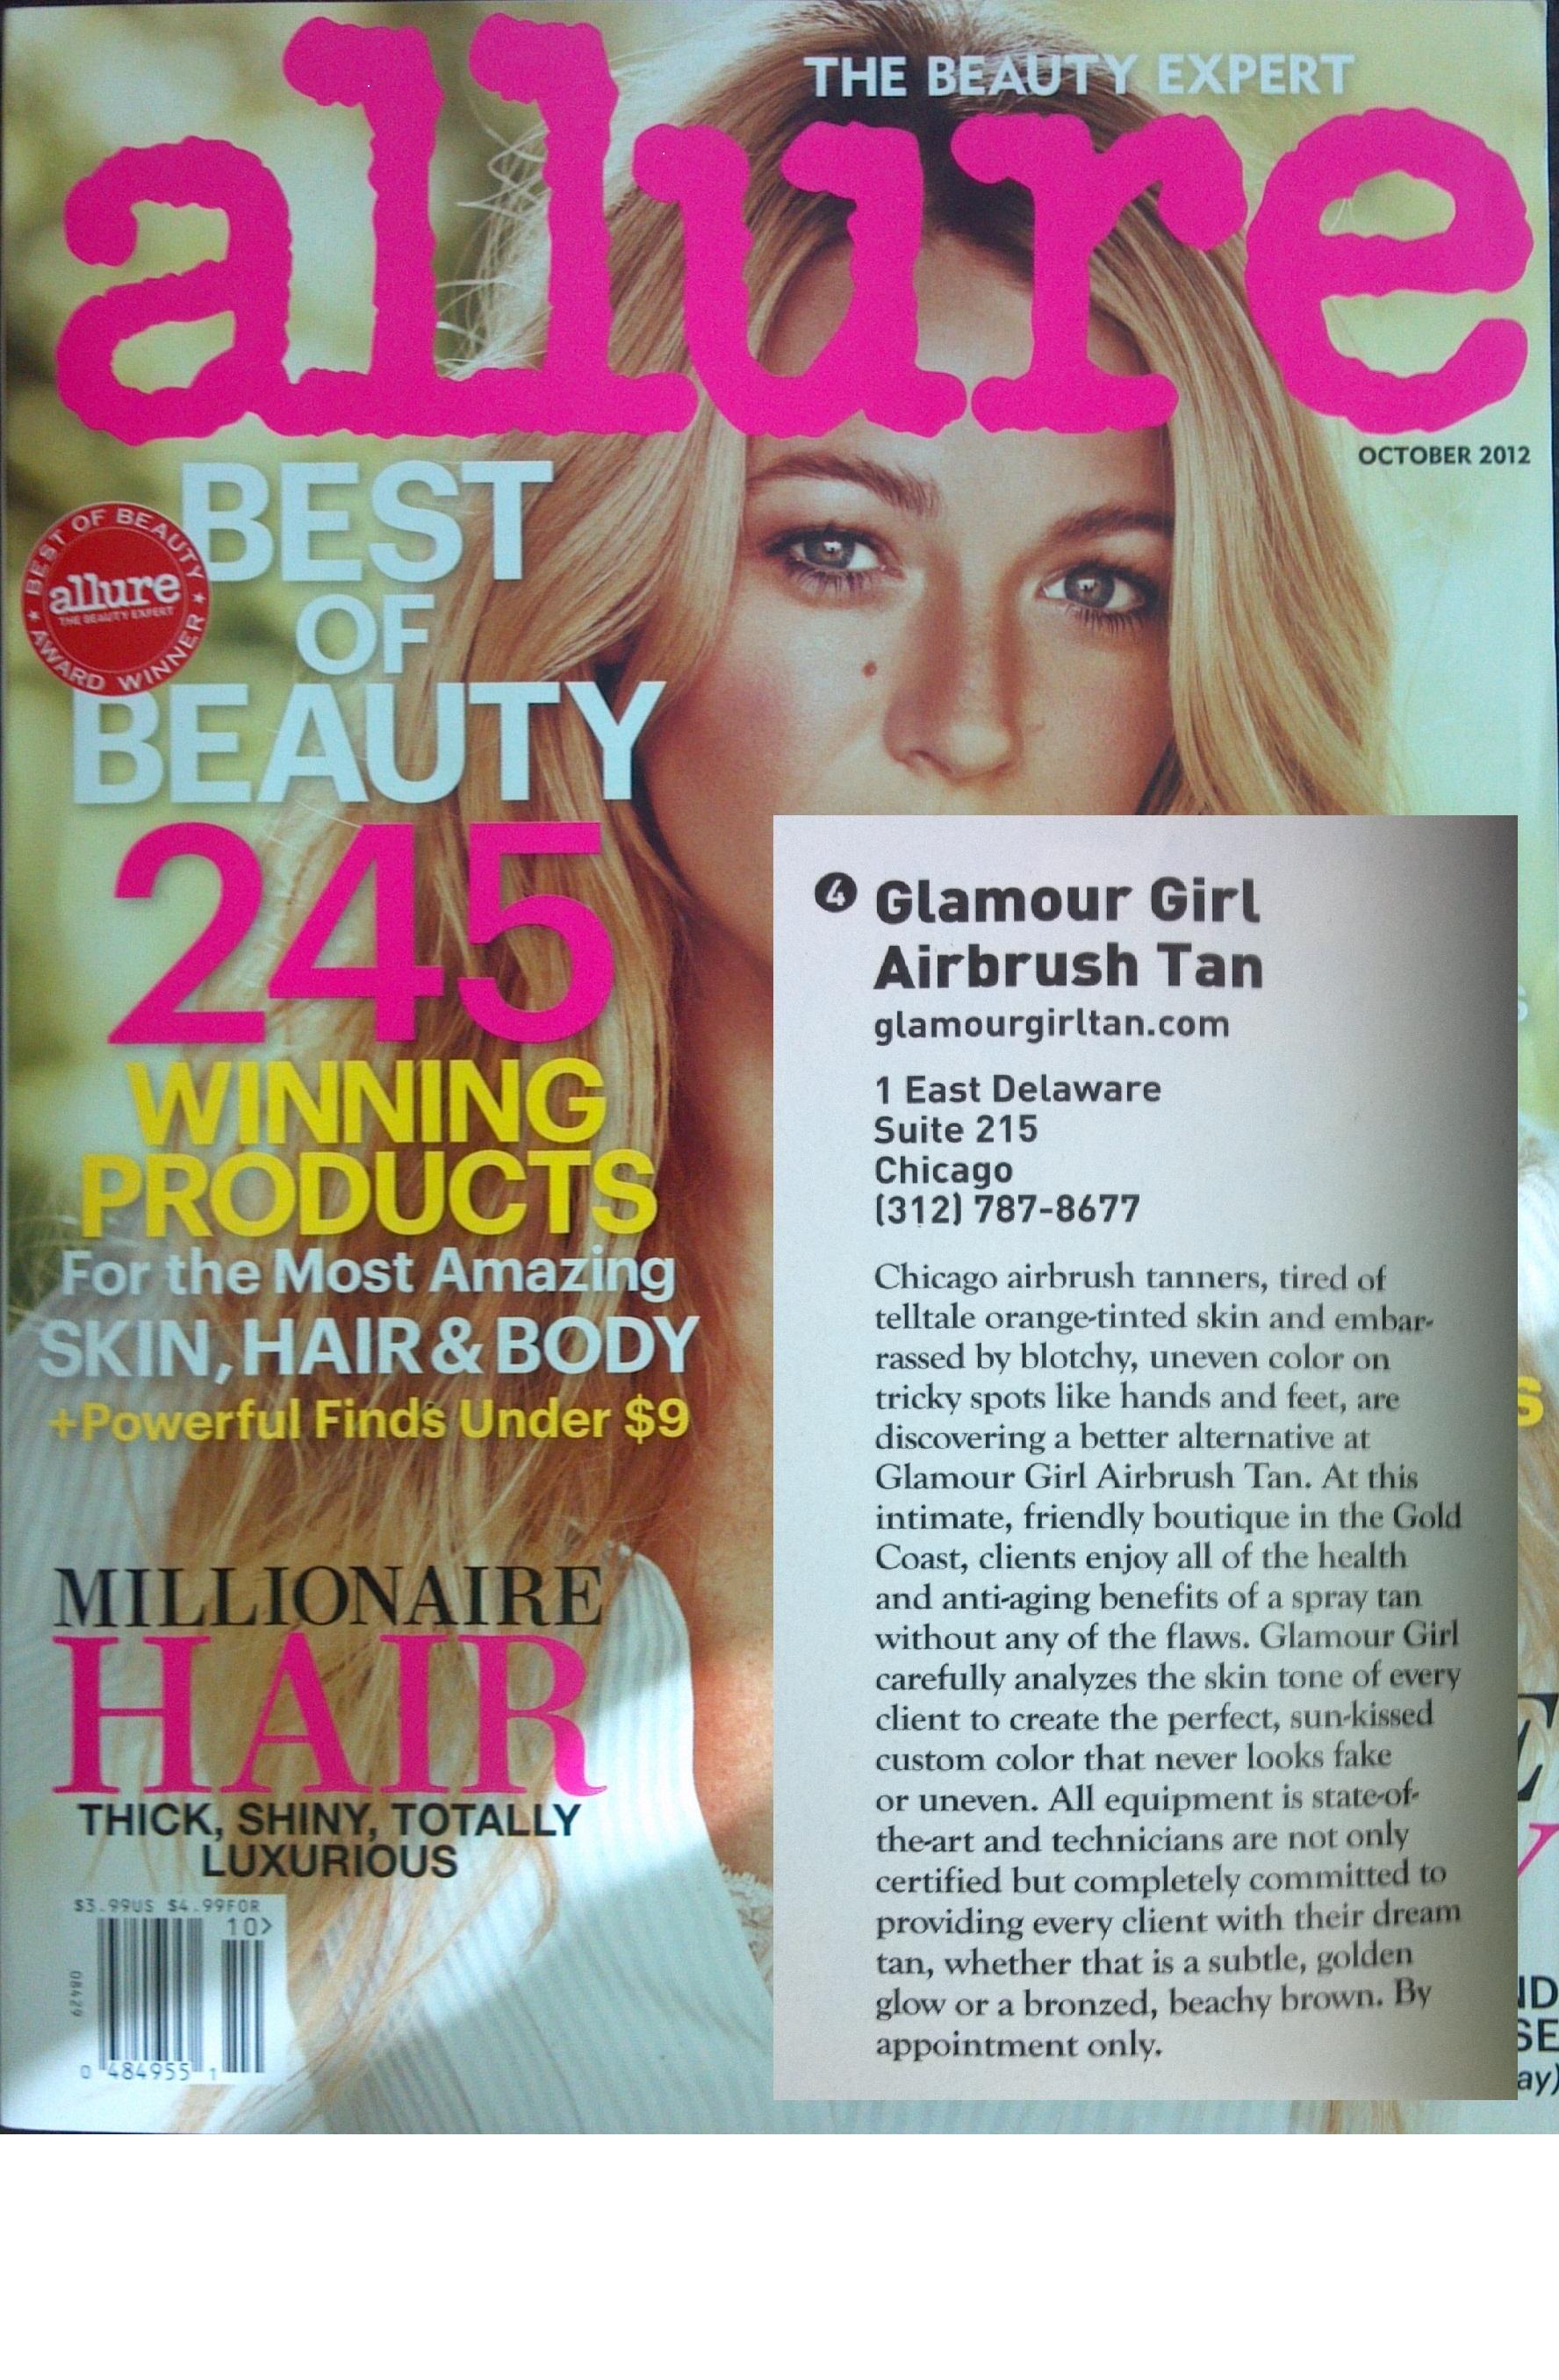 Allure+Glamour+Girl+Airbrush+Tan+1.jpg